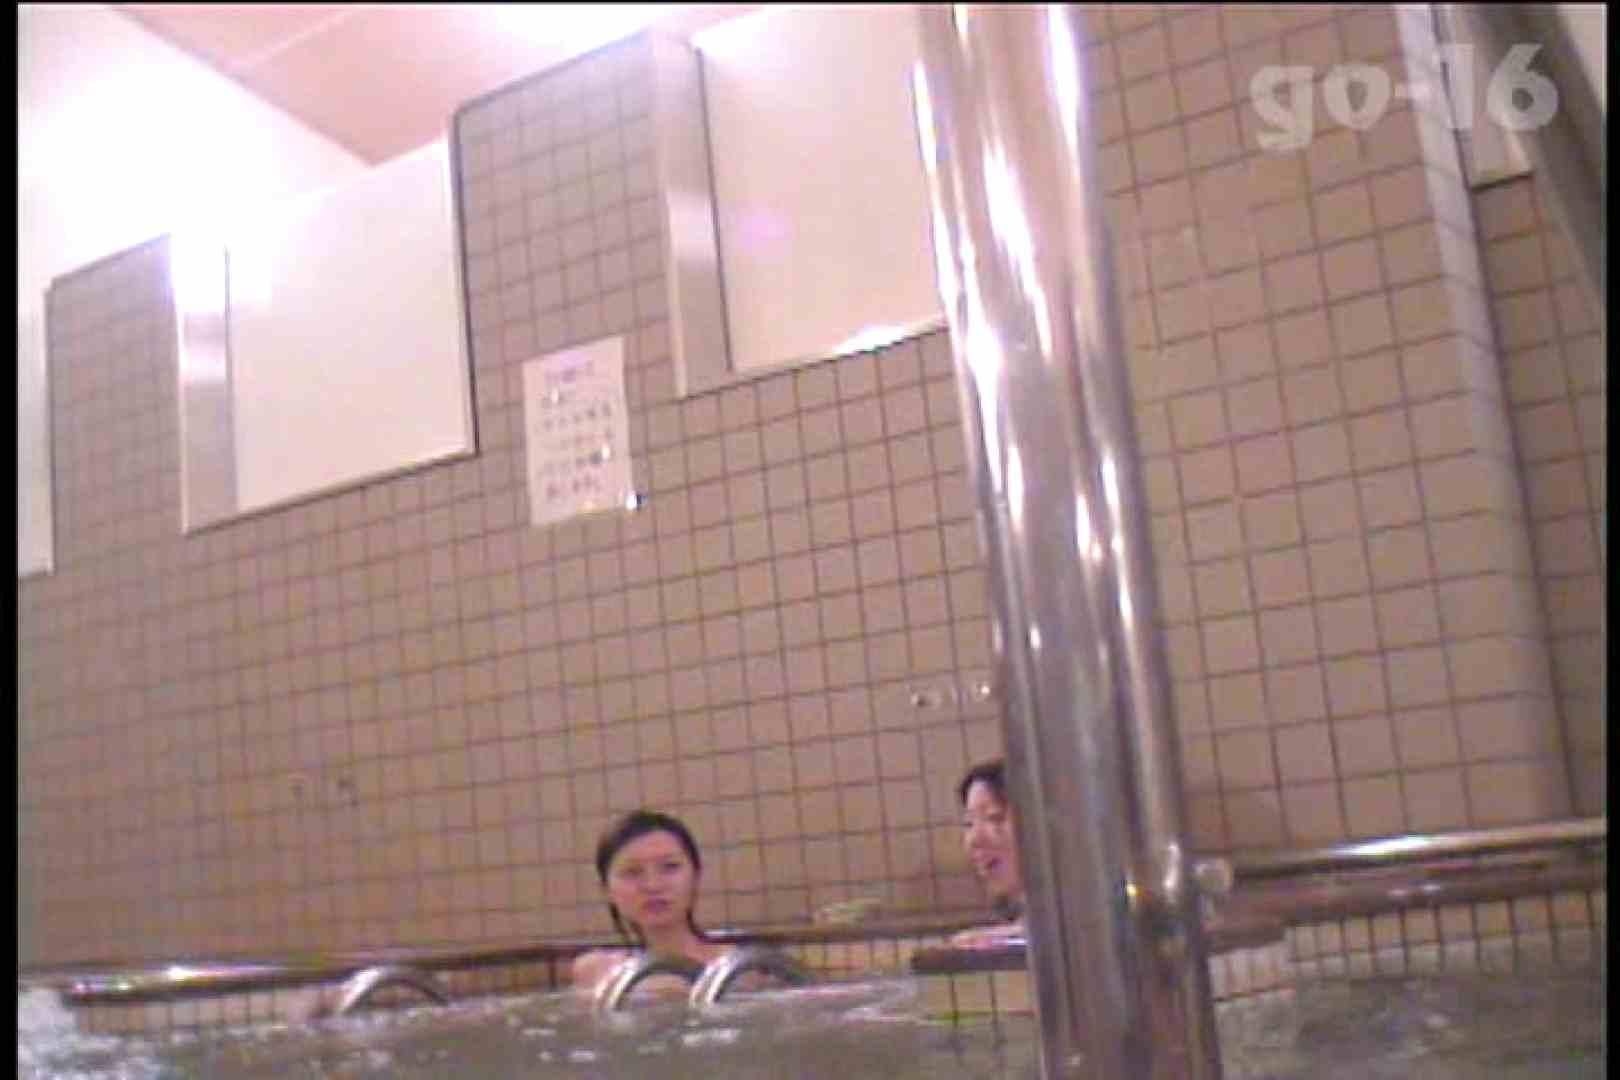 厳選潜入女風呂 No.16 盗撮 オマンコ無修正動画無料 105画像 50